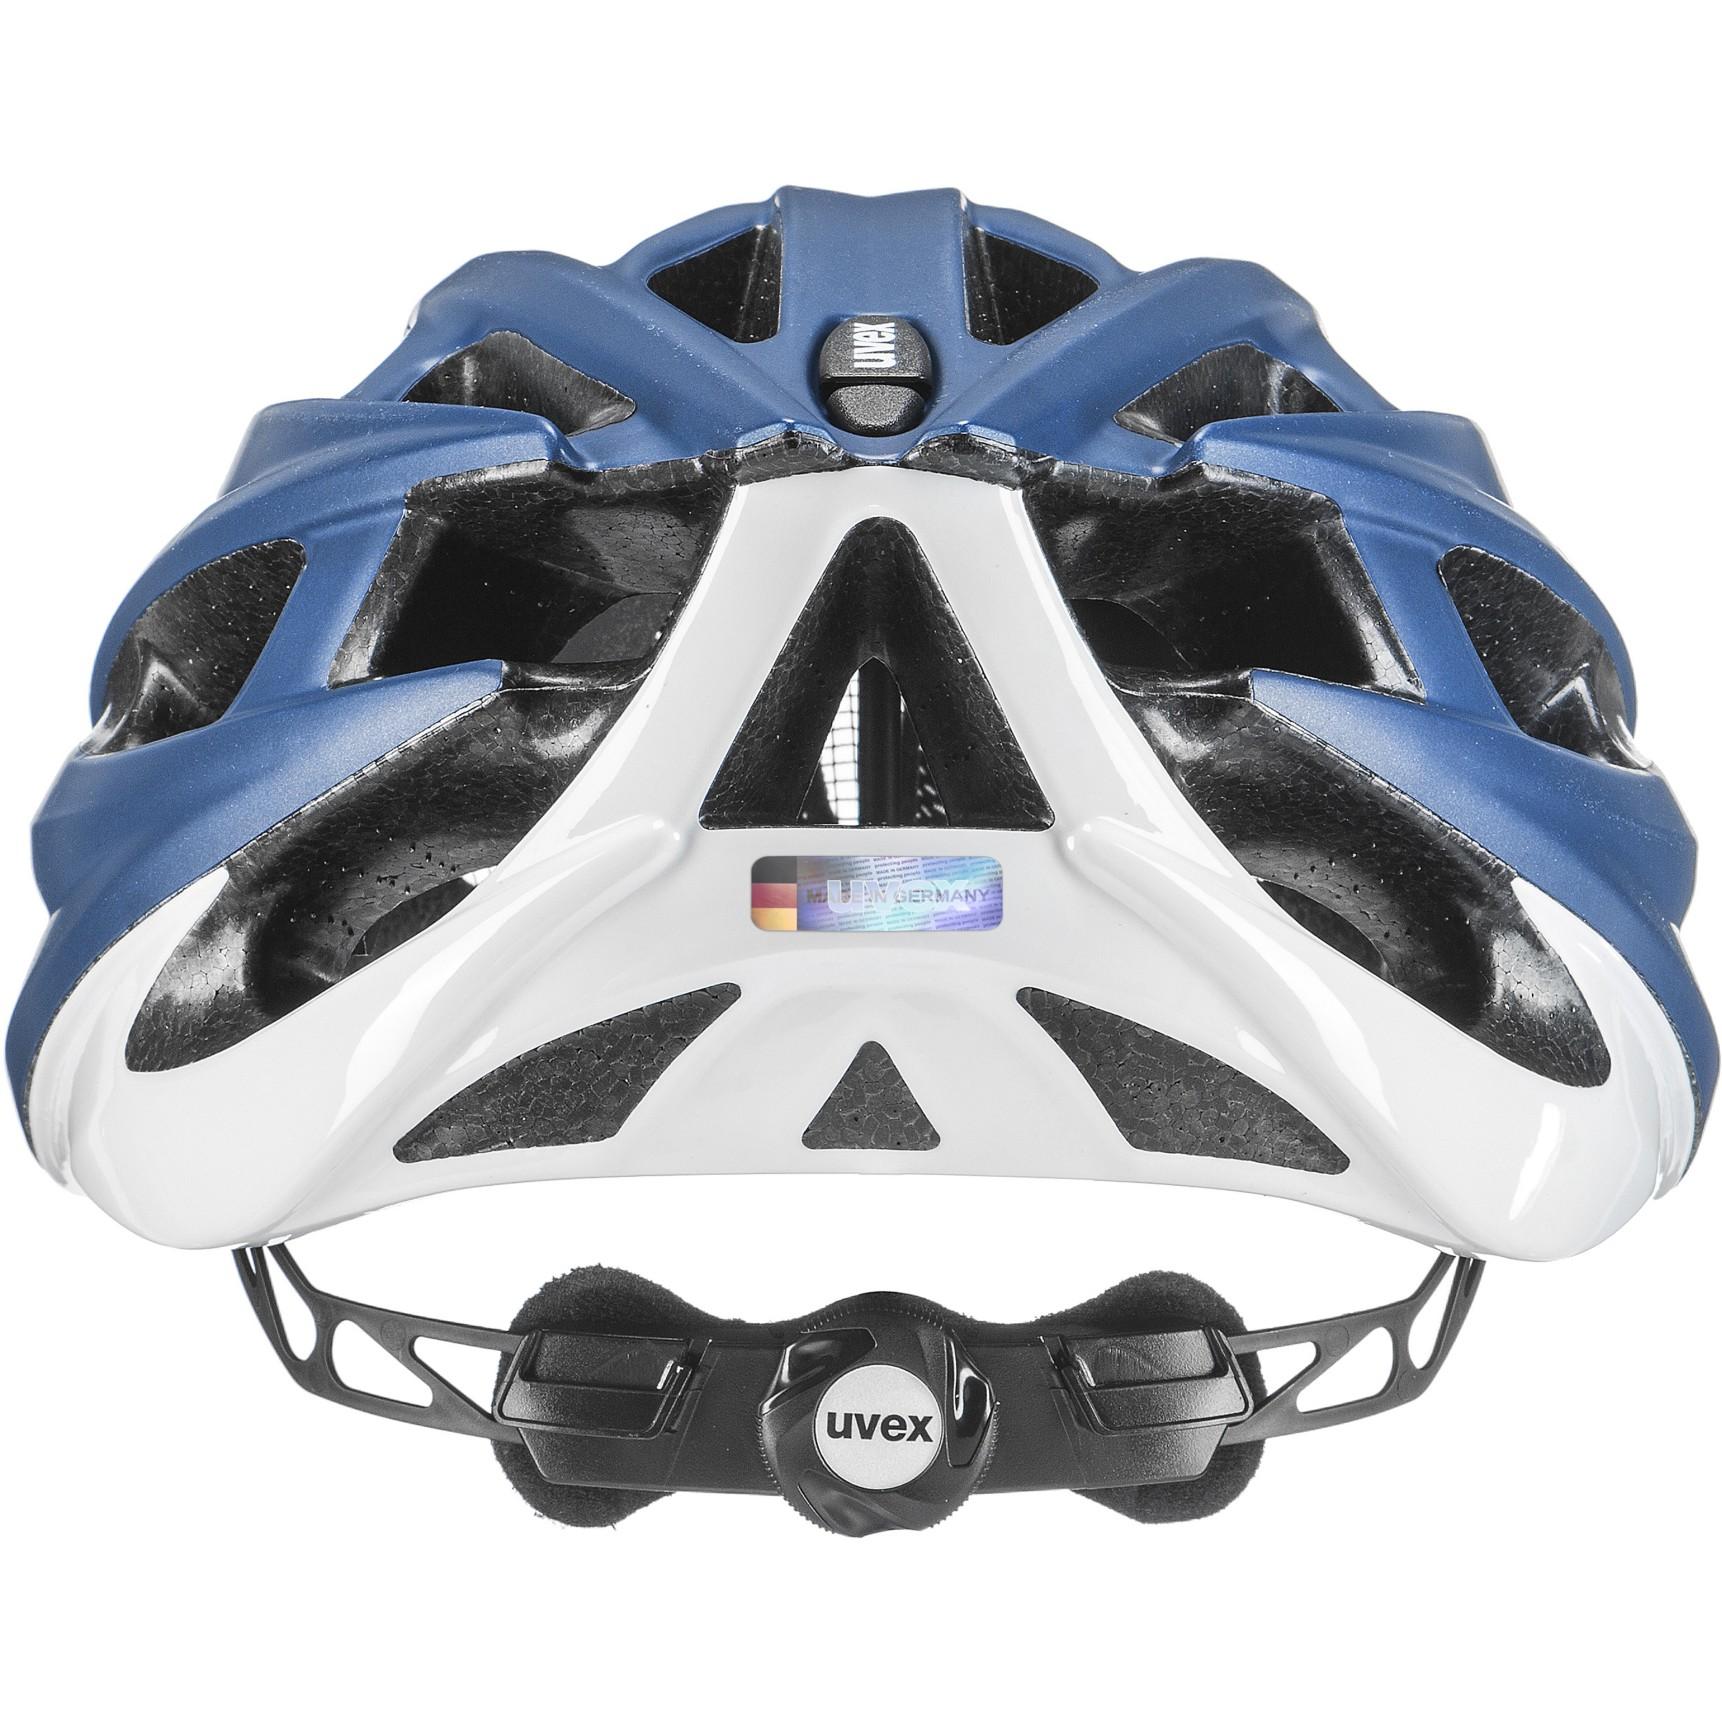 Image of Uvex Oversize Helmet - blue mat